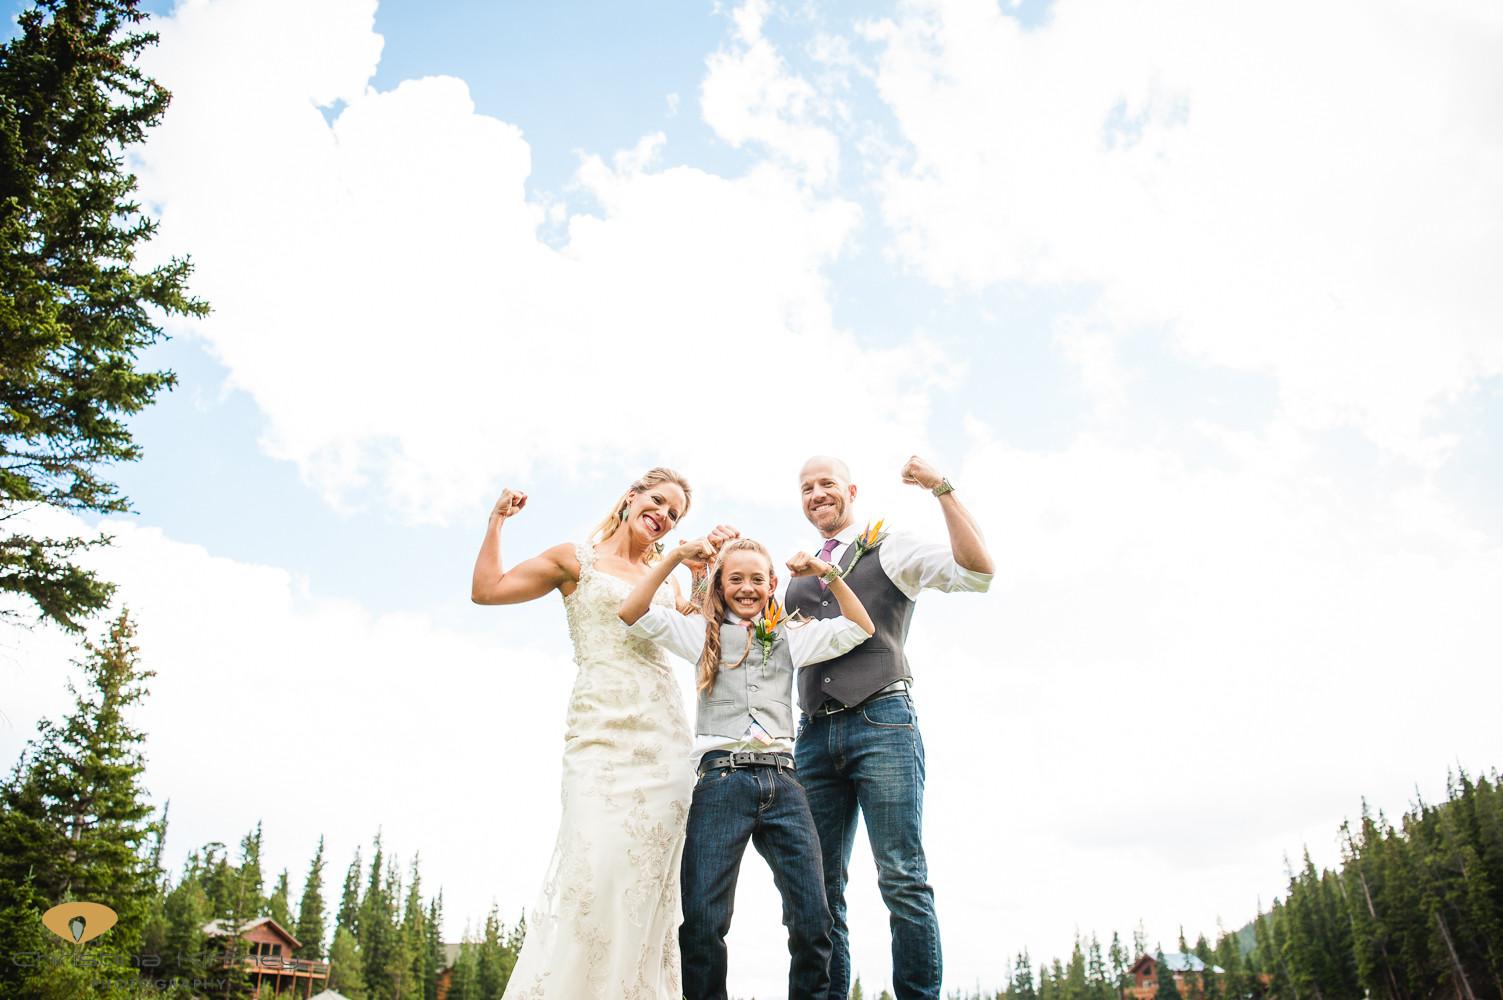 ckp-Colorado-Family-Elopement-0058.jpg